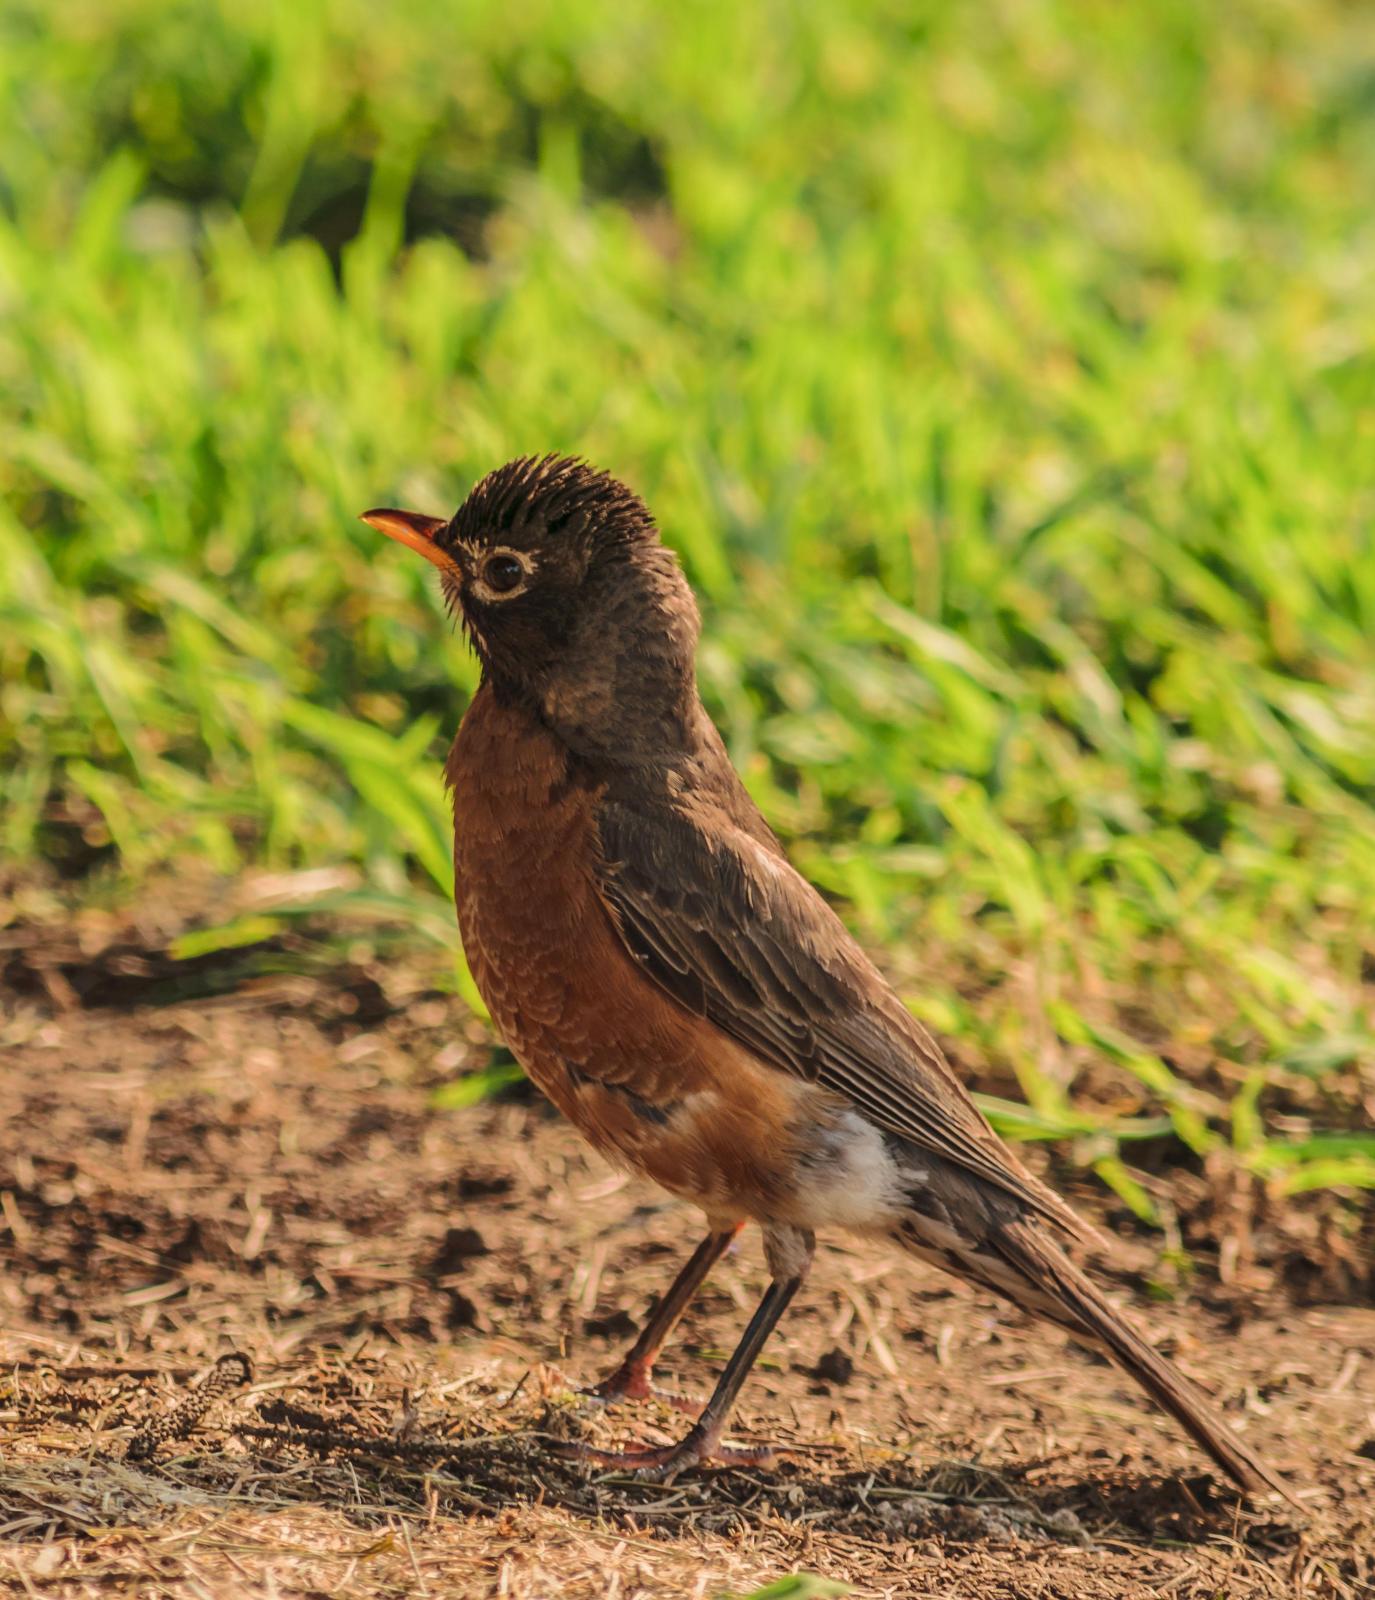 American Robin Photo by Keshava Mysore